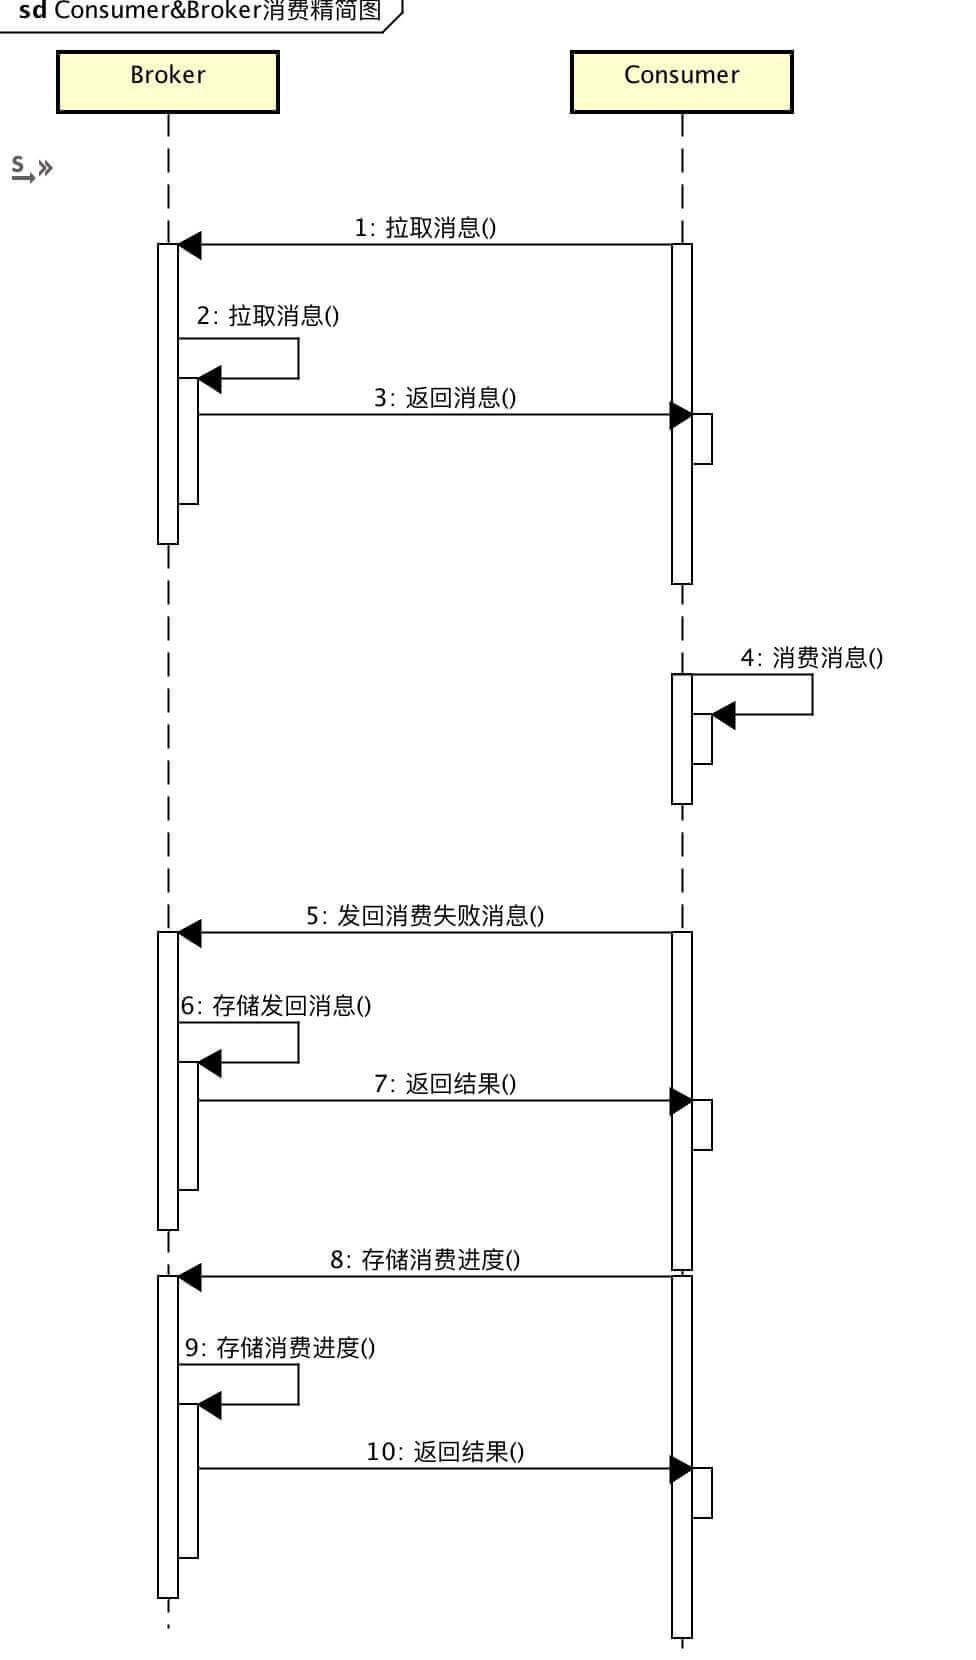 Consumer&Broker消费精简图.png